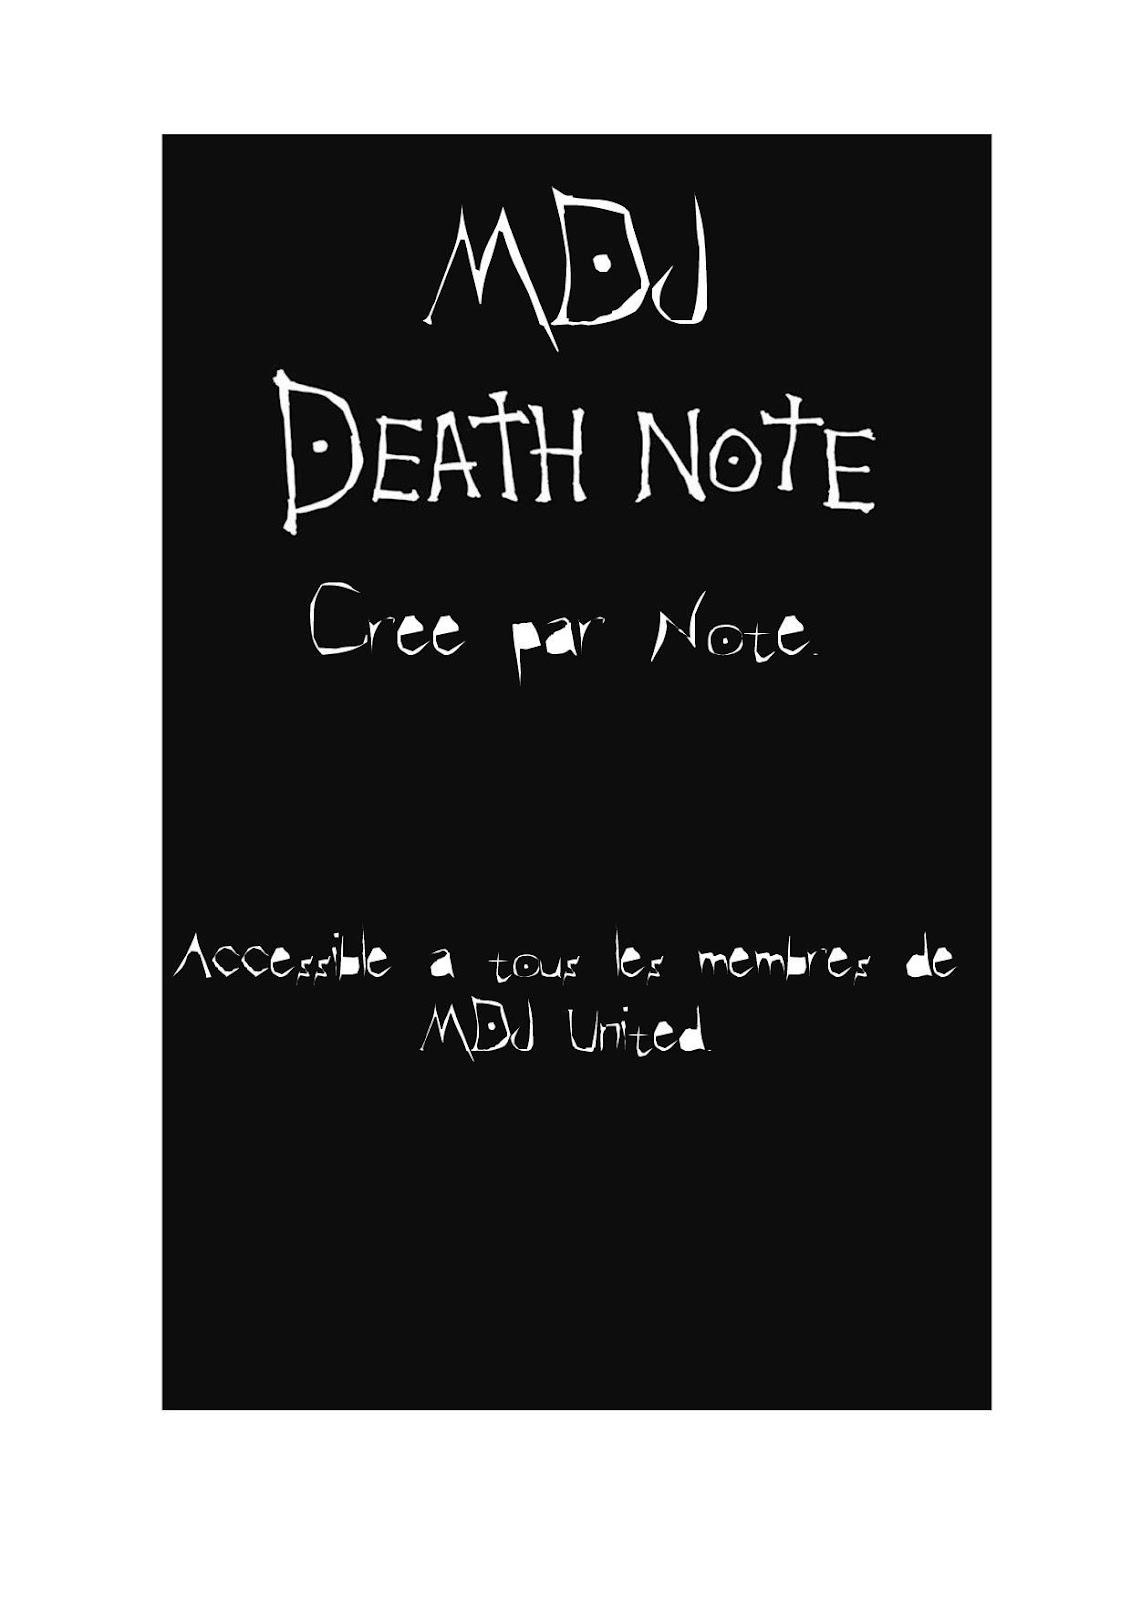 C:\Users\New-e\AppData\Local\Microsoft\Windows\INetCacheContent.Word\MDJ-page-001.jpg